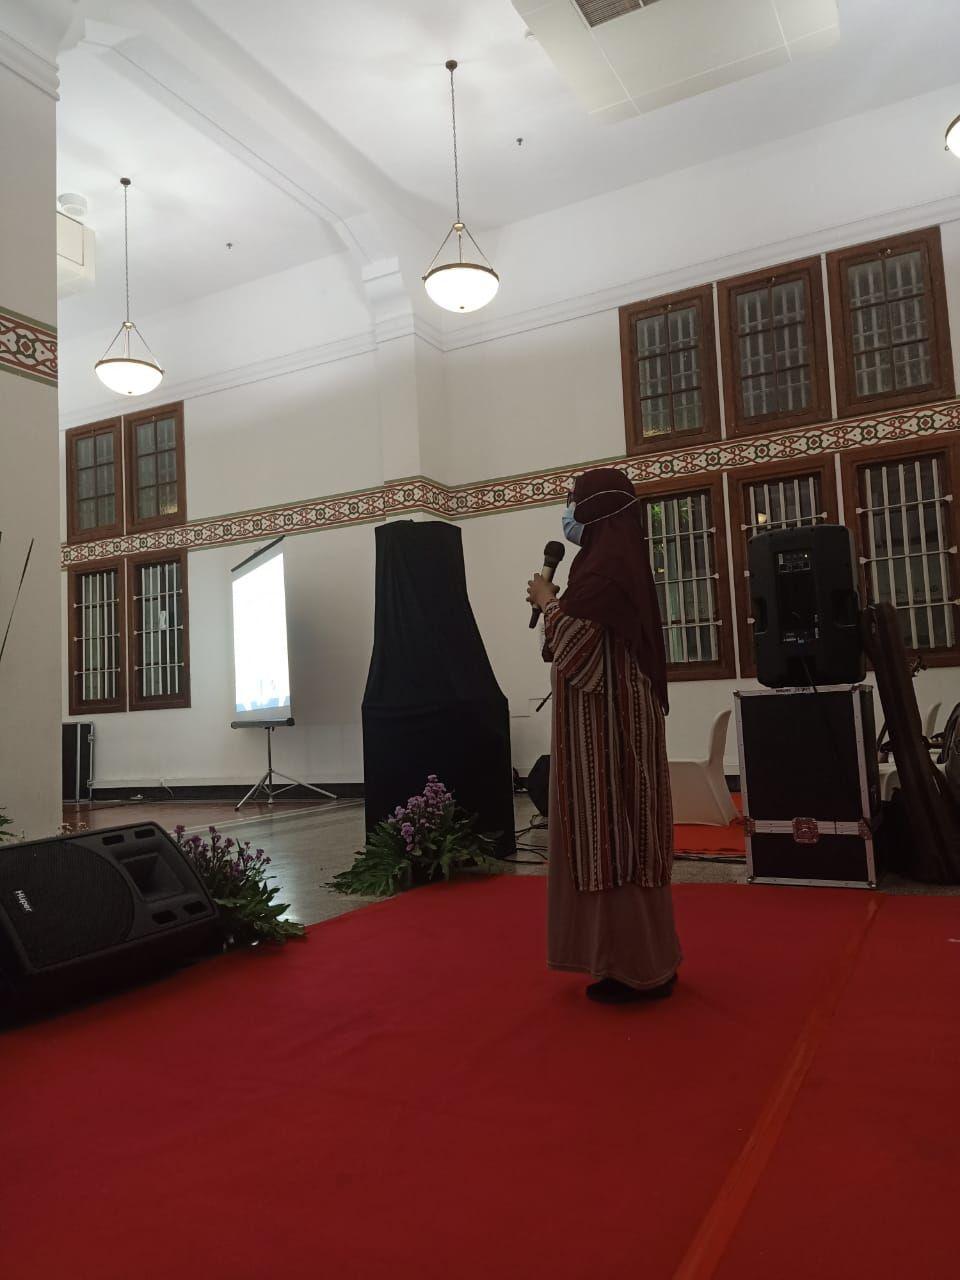 Mengisi Ramadan dengan Melatih Percaya Diri